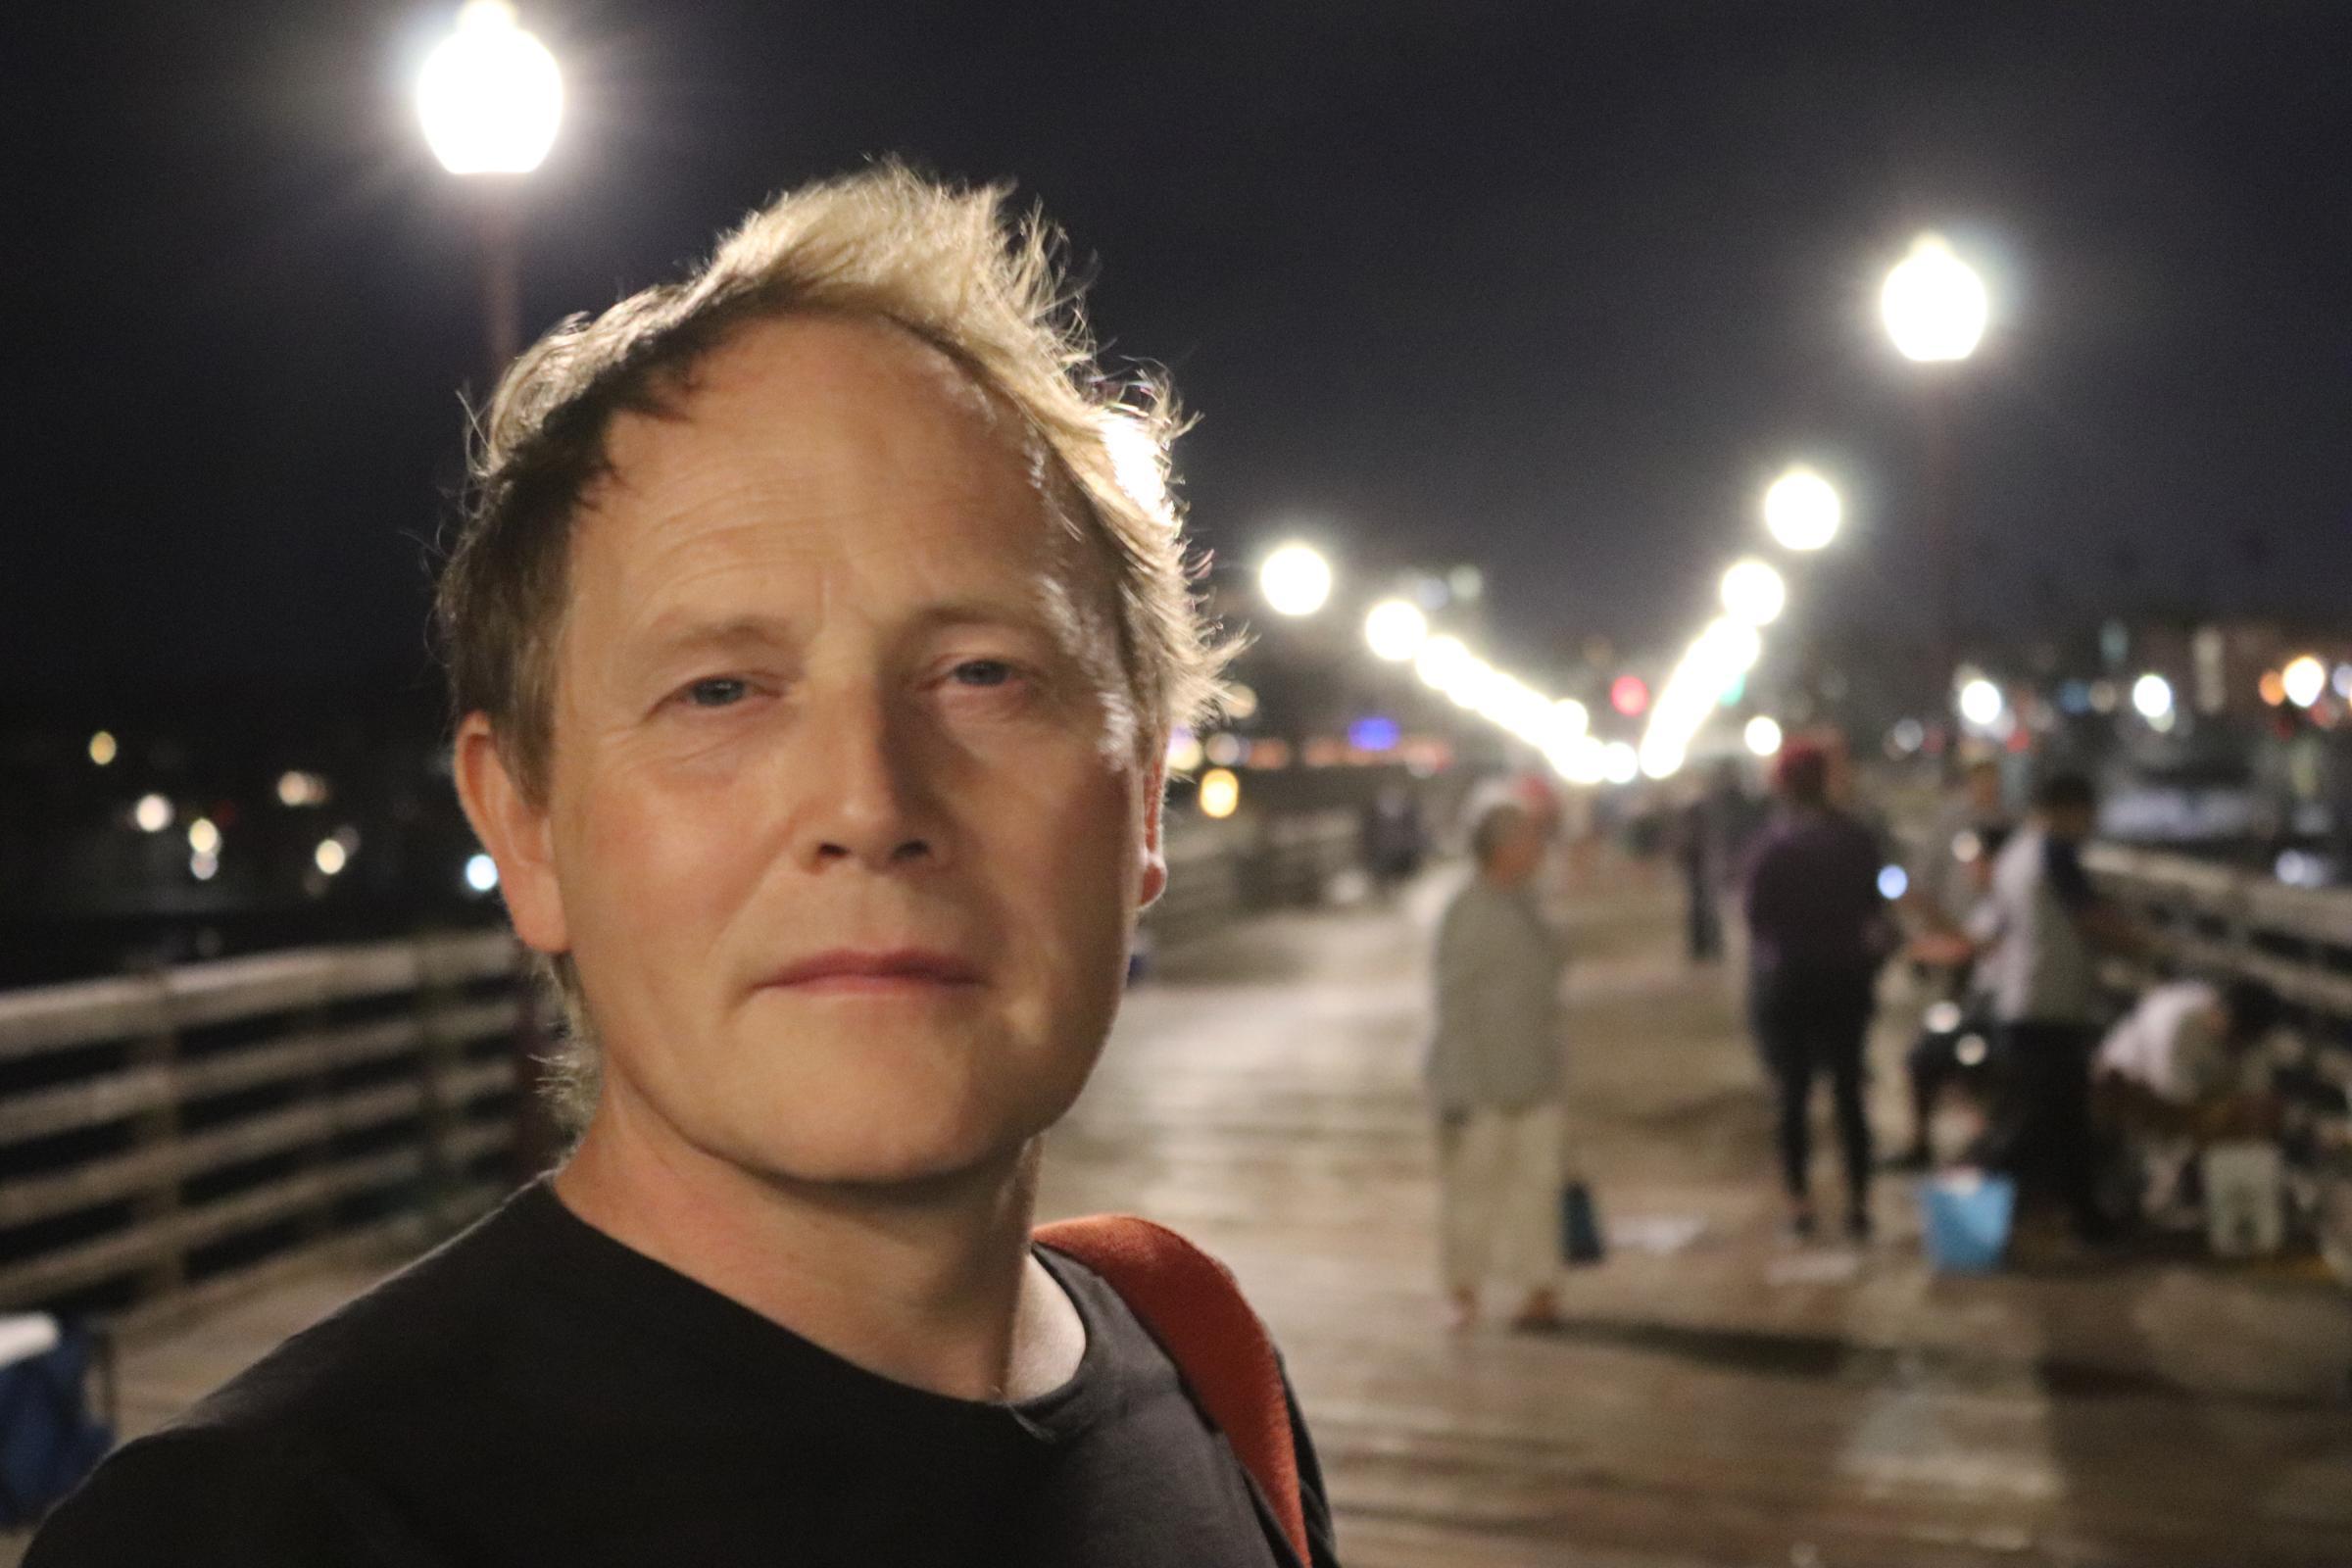 Bradford-born director and writer's radio drama about Andrea Dunbar